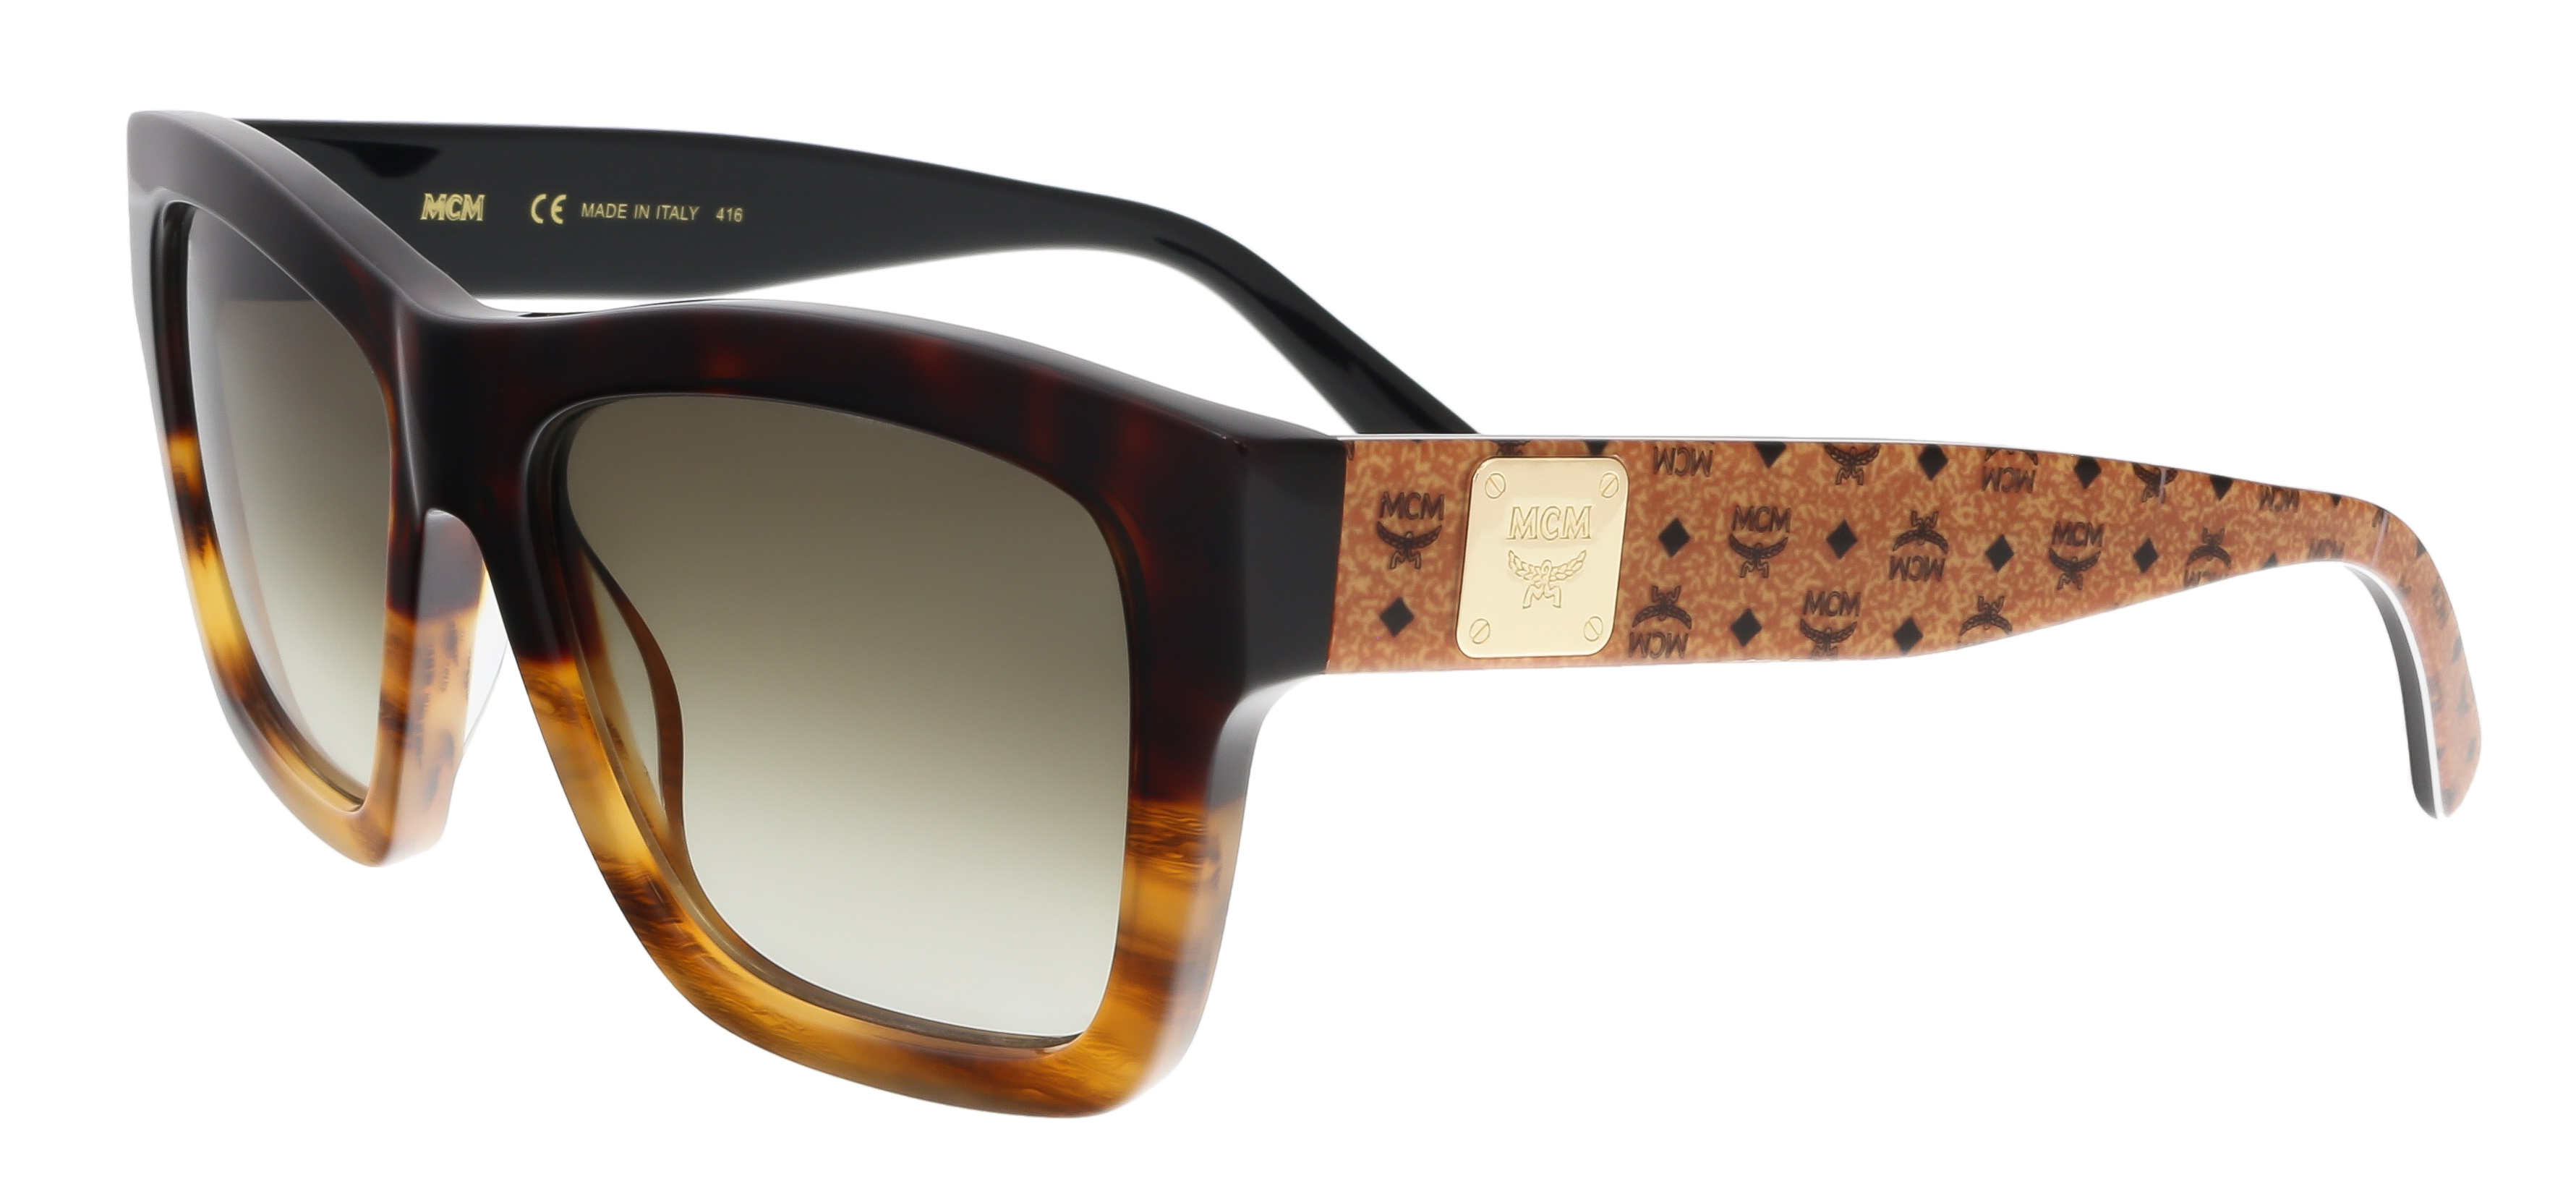 MCM607S 634 Red Havana-Striped Cognac Square Feline Sunglasses